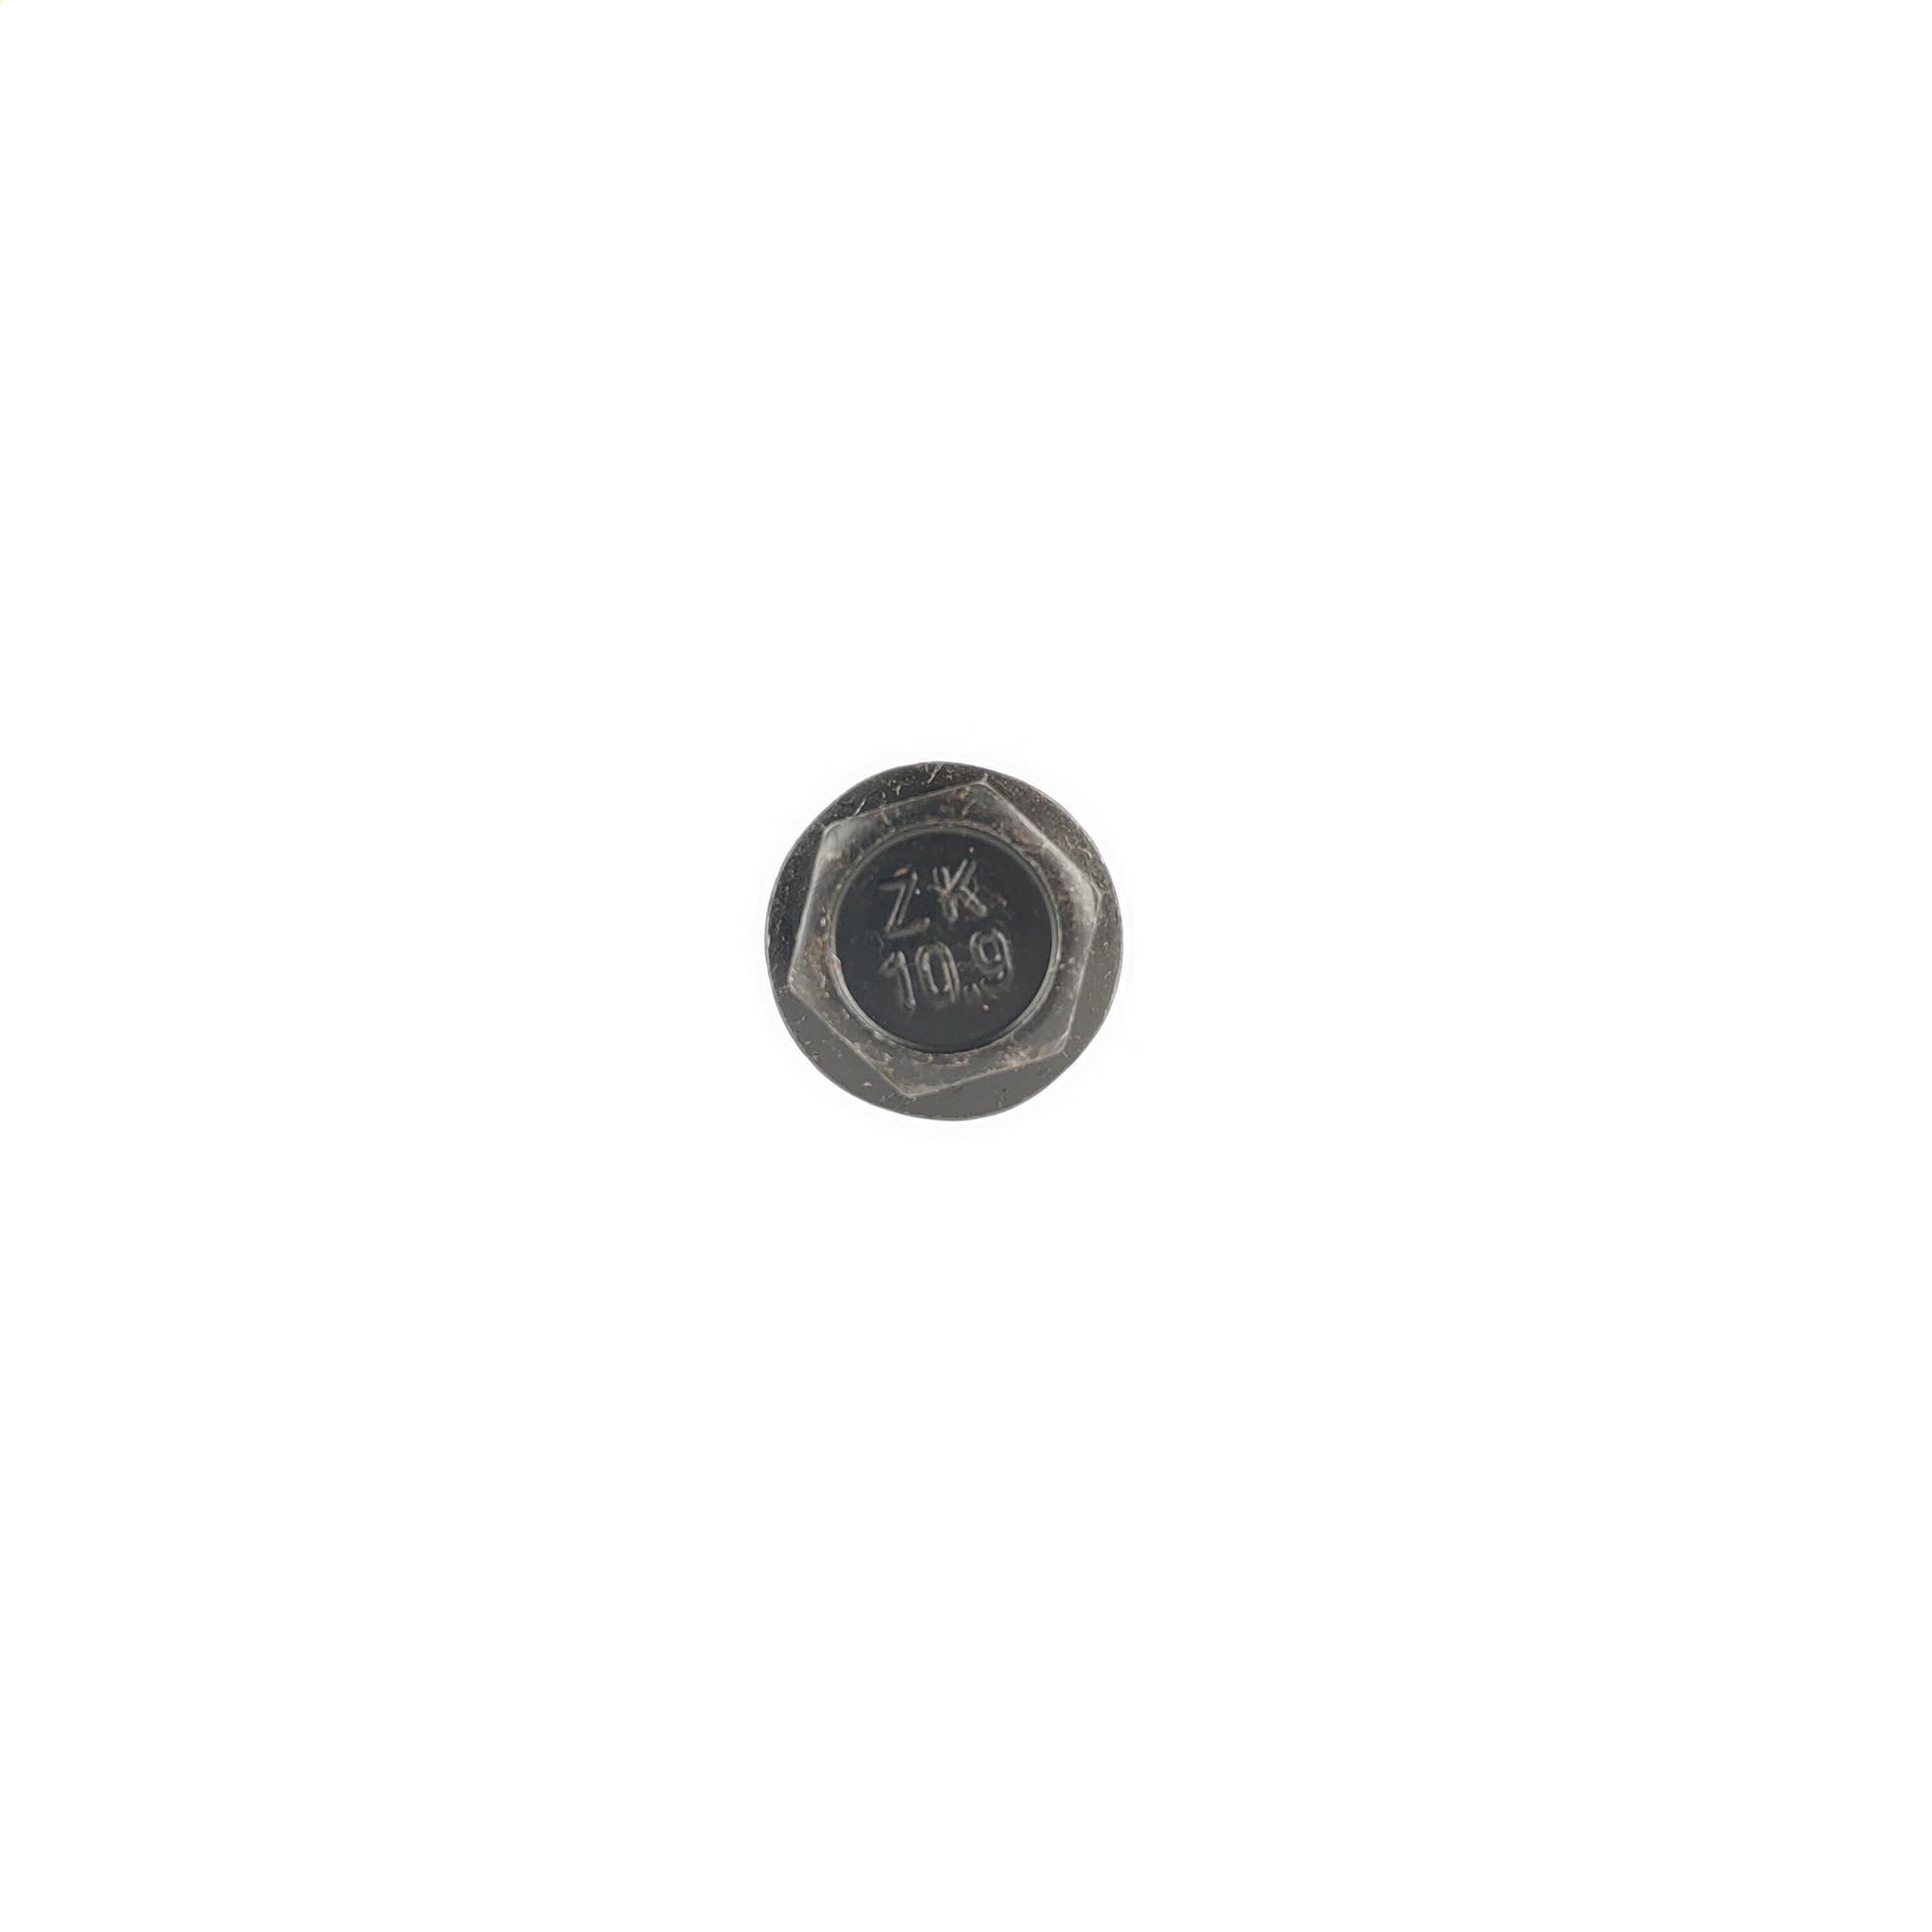 Eixo de Centro Bicicleta Saiguan 34,7 5U 129,5mm 03618